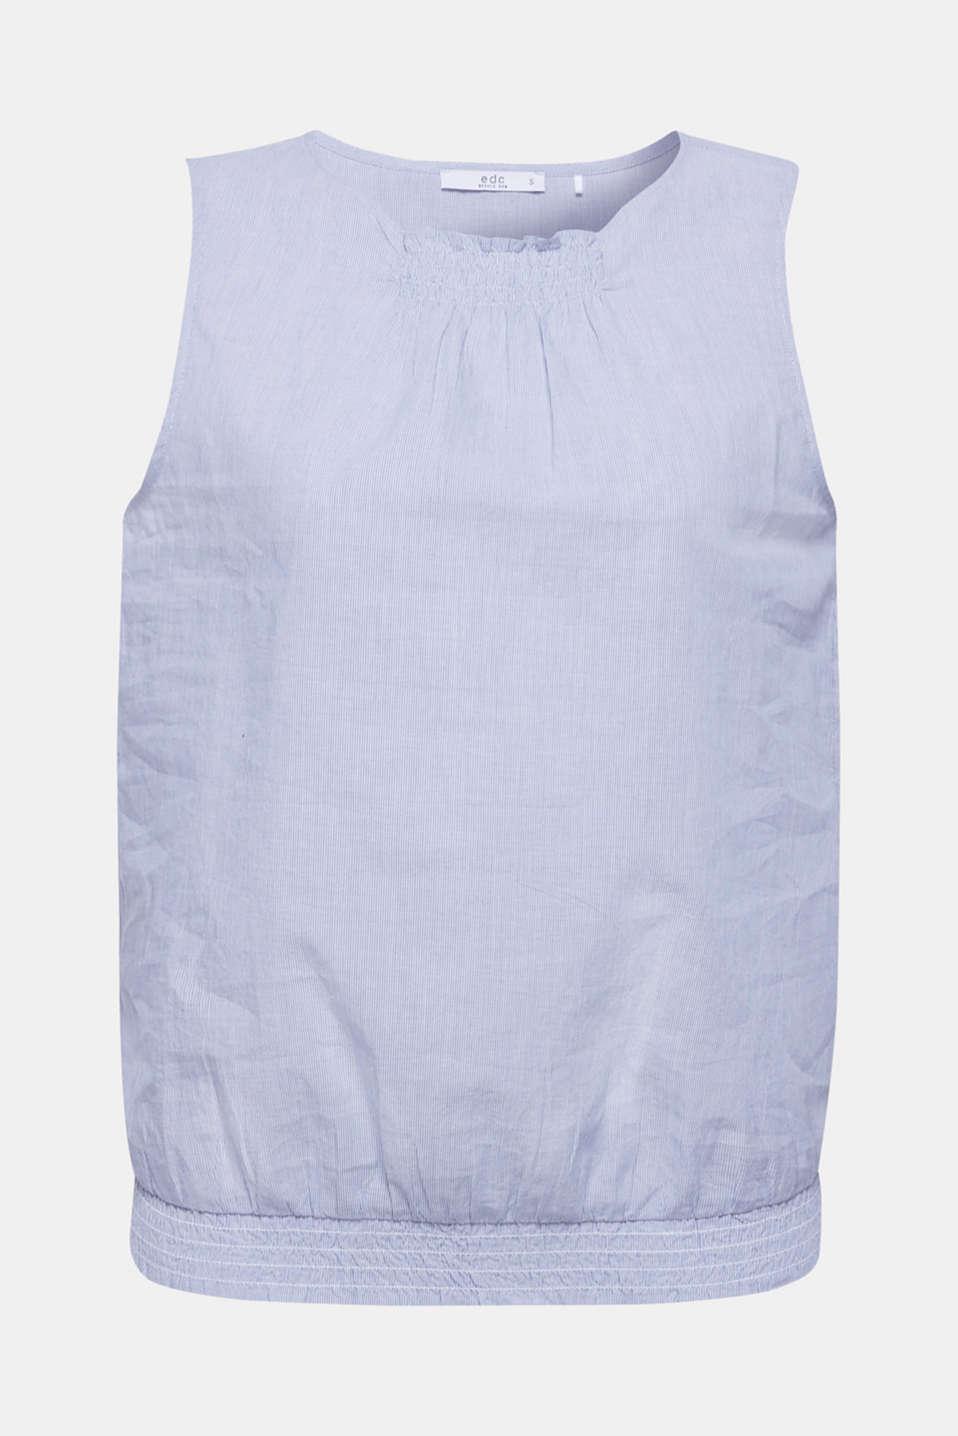 Blouses woven, LIGHT BLUE, detail image number 7